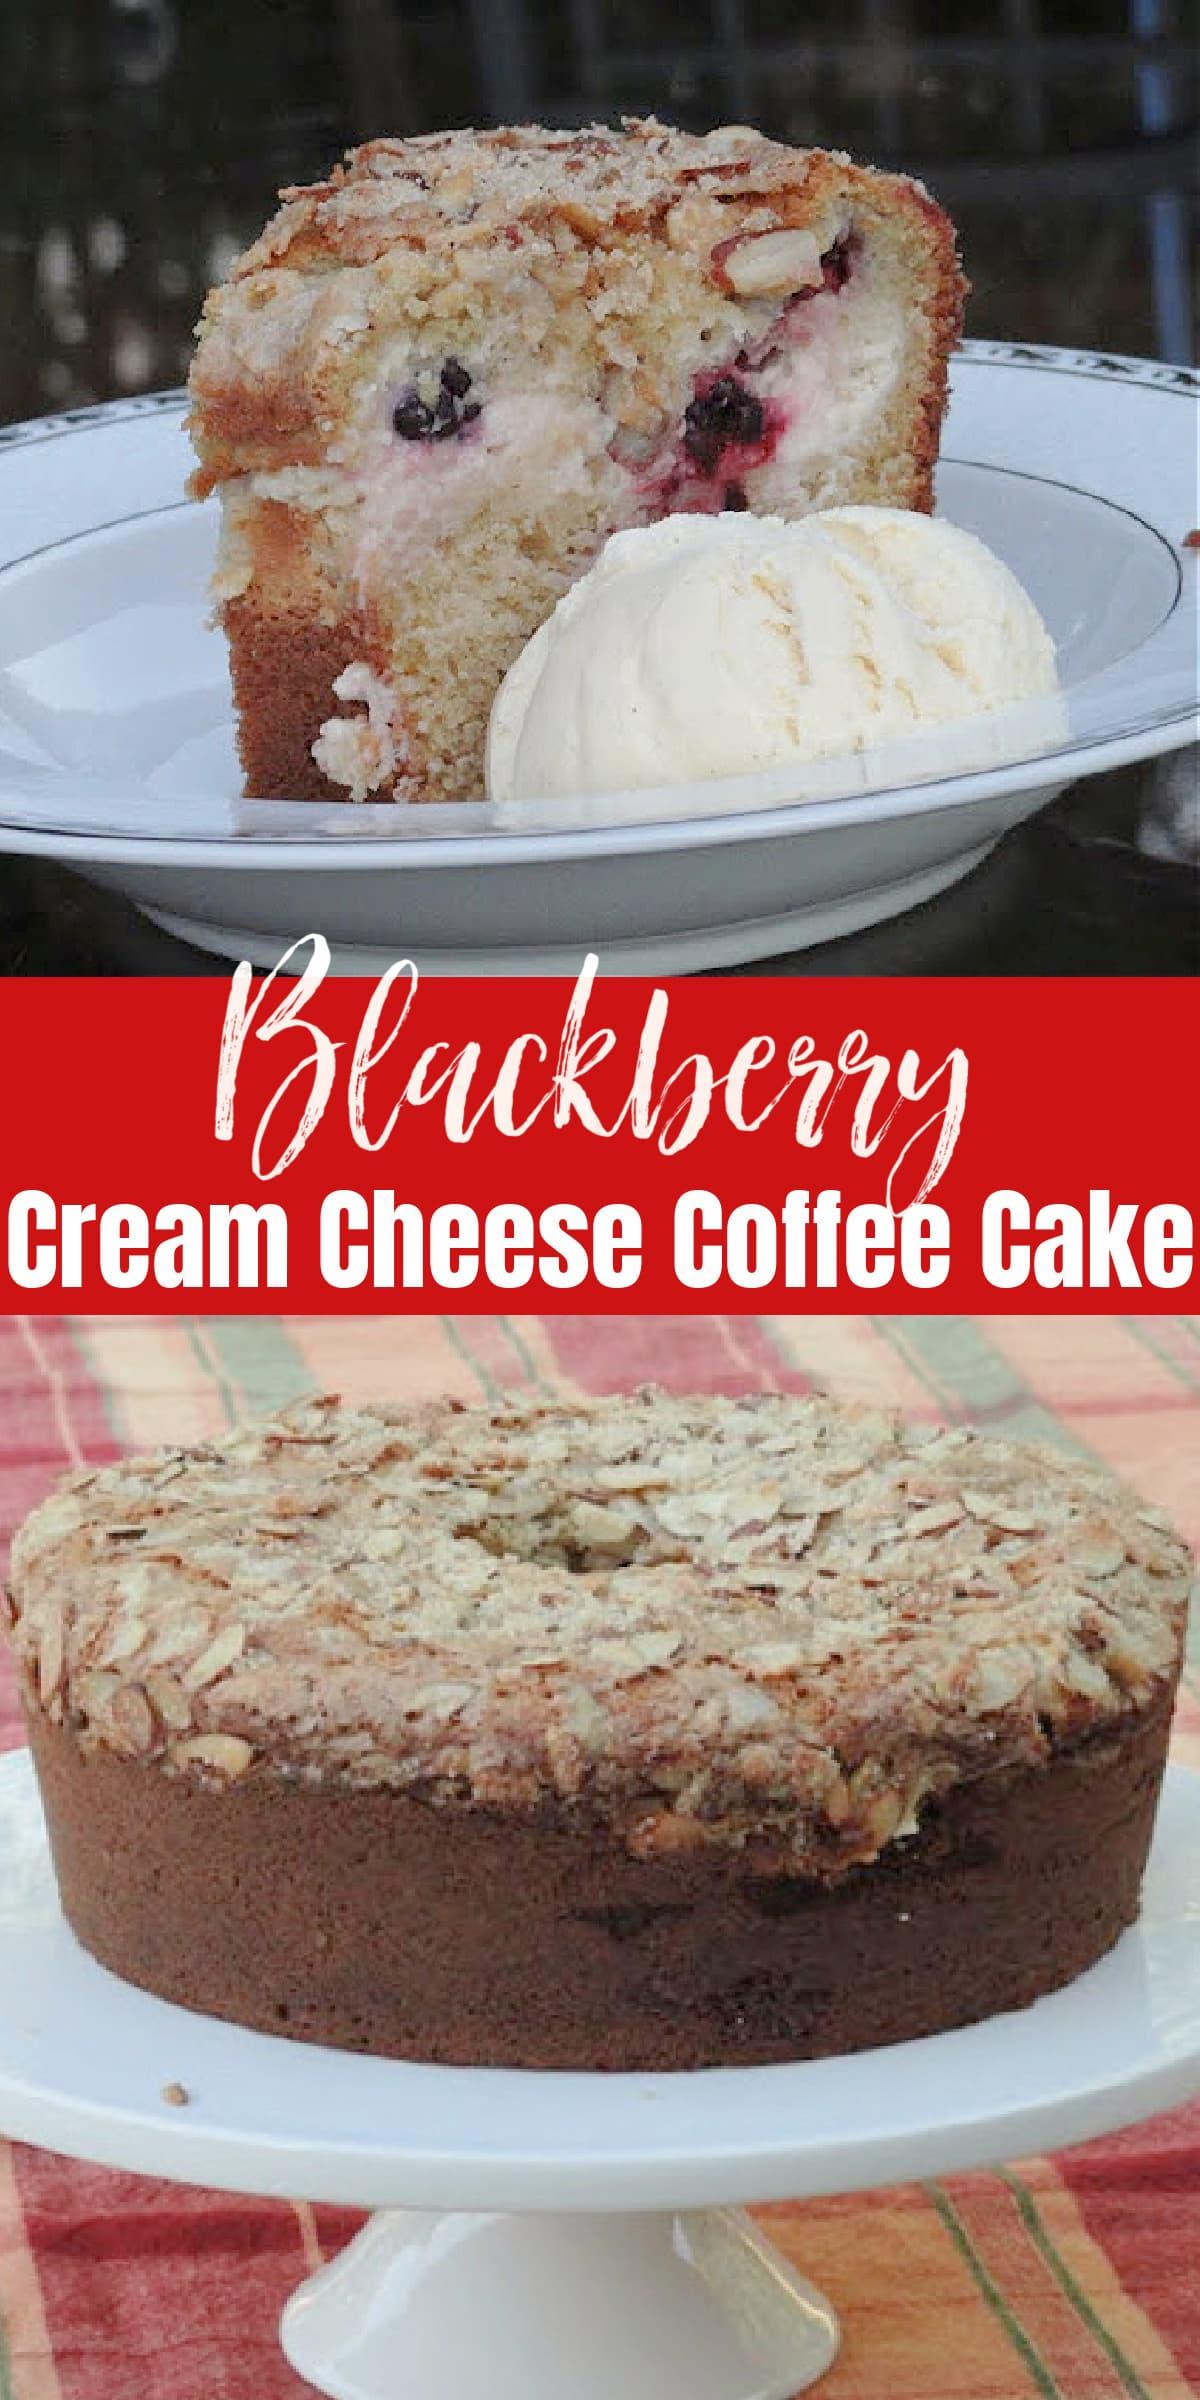 Blackberry Cream Cheese Coffee Cake two photos the top photo is a slice of Blackberry Cream Cheese Coffee Cake and the bottom photo is of a whole cake.